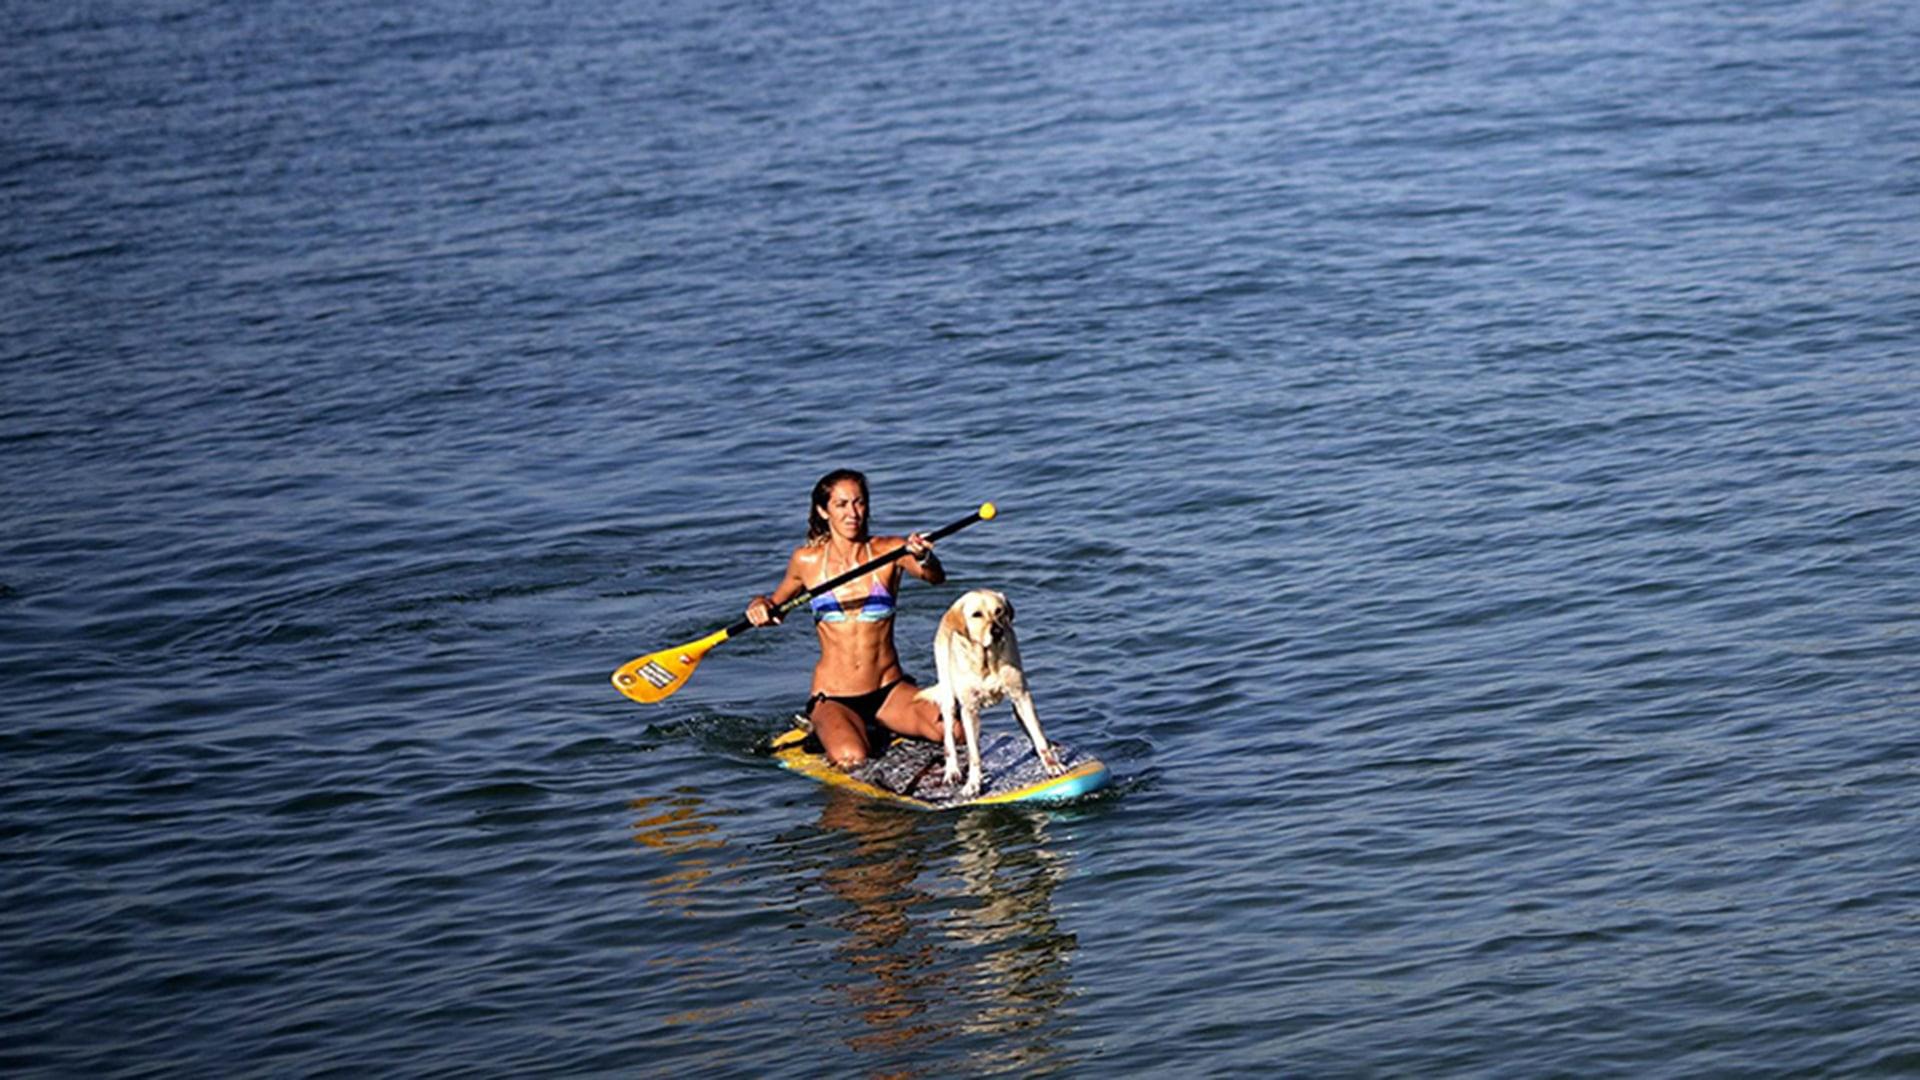 Image: A woman paddles with her  dog at Arpoador beach in Rio de Janeiro